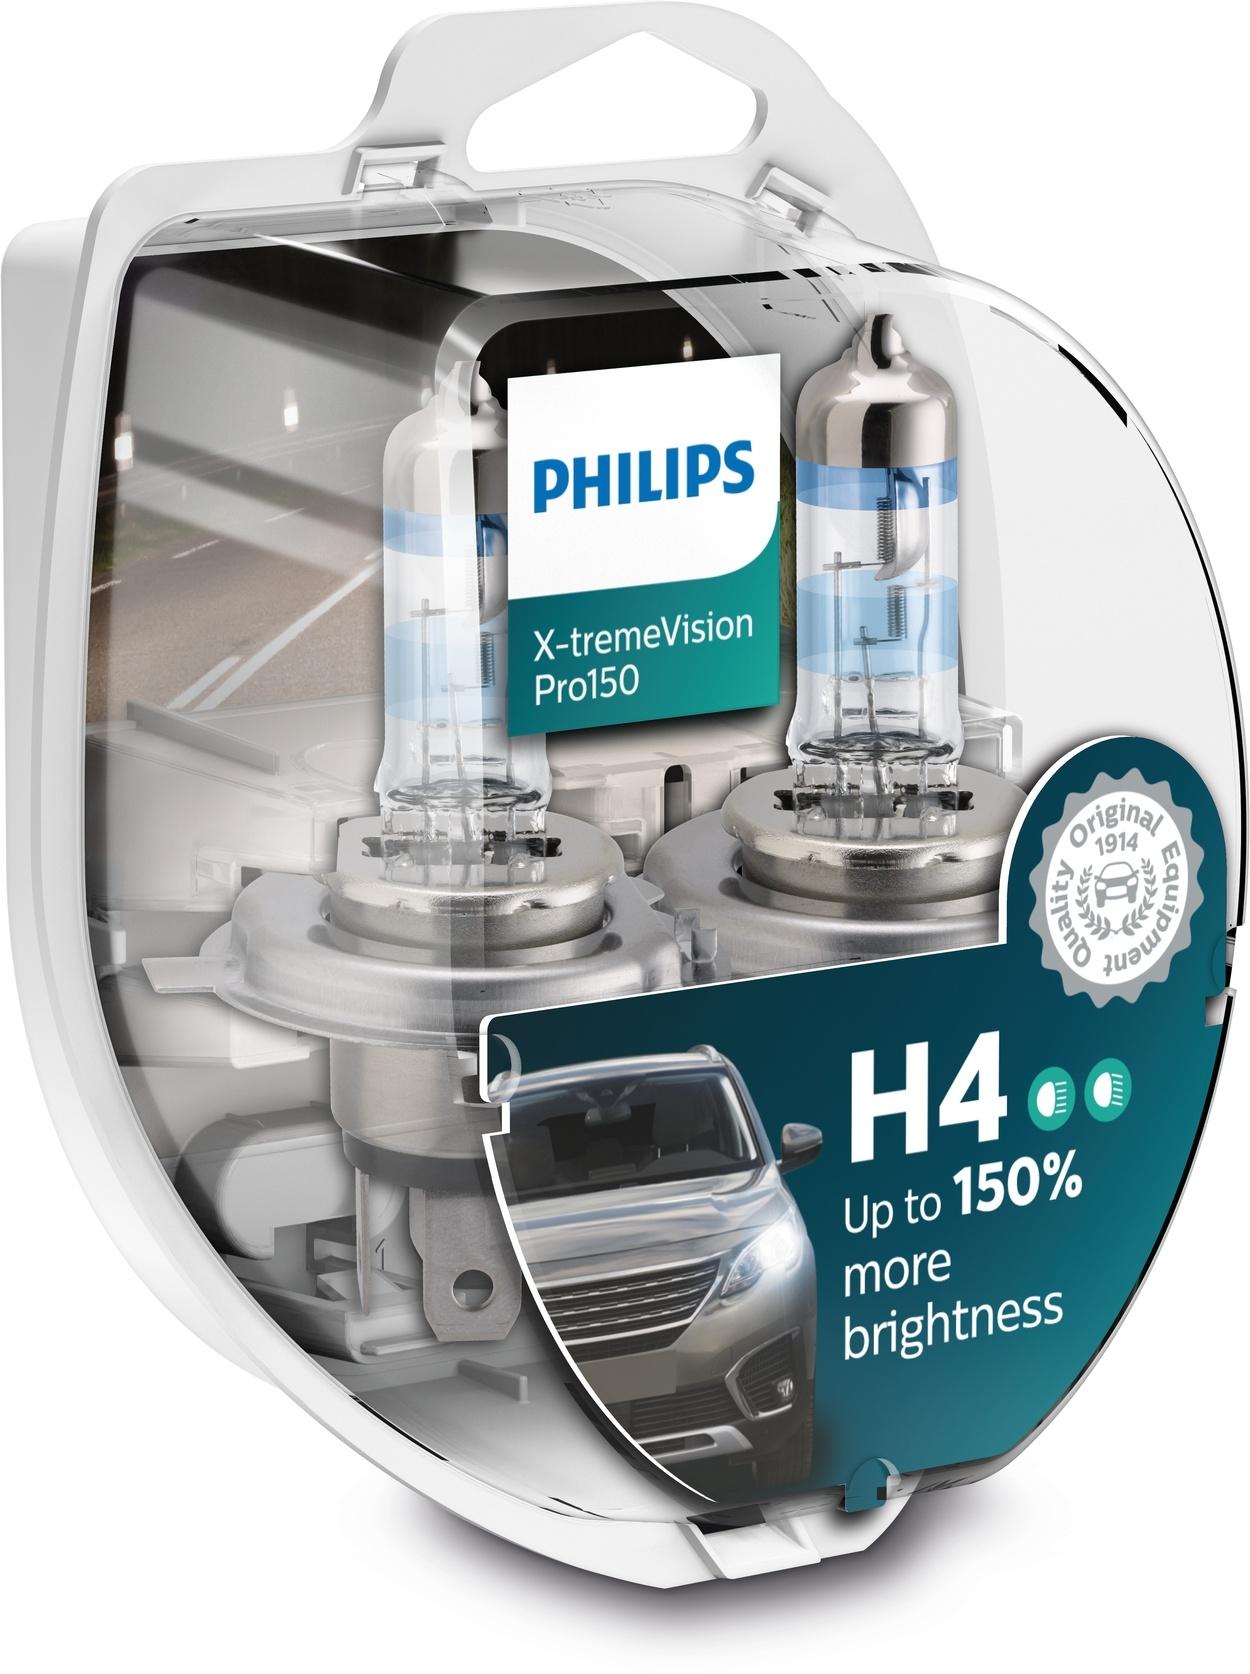 Philips H4 XtremeVision pro150 Duobox